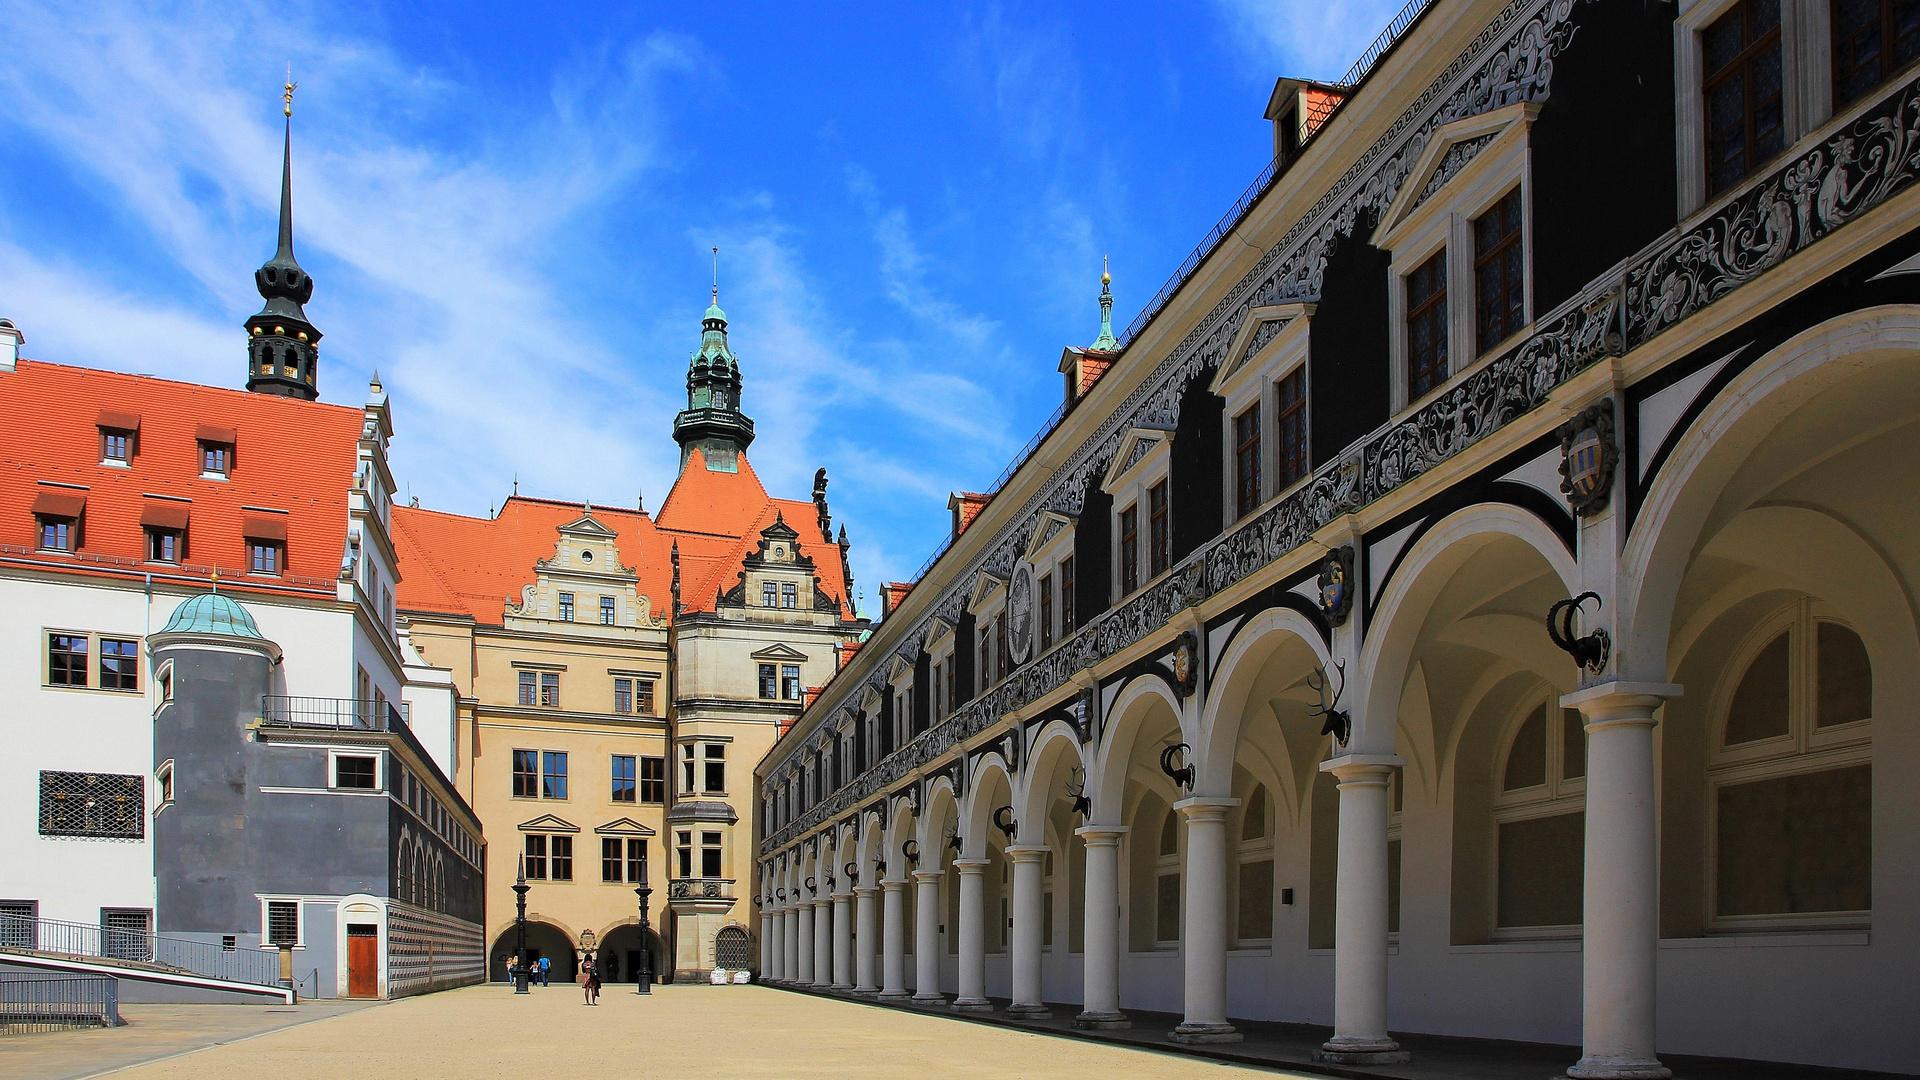 Stallhof und Residenzschloss Dresden